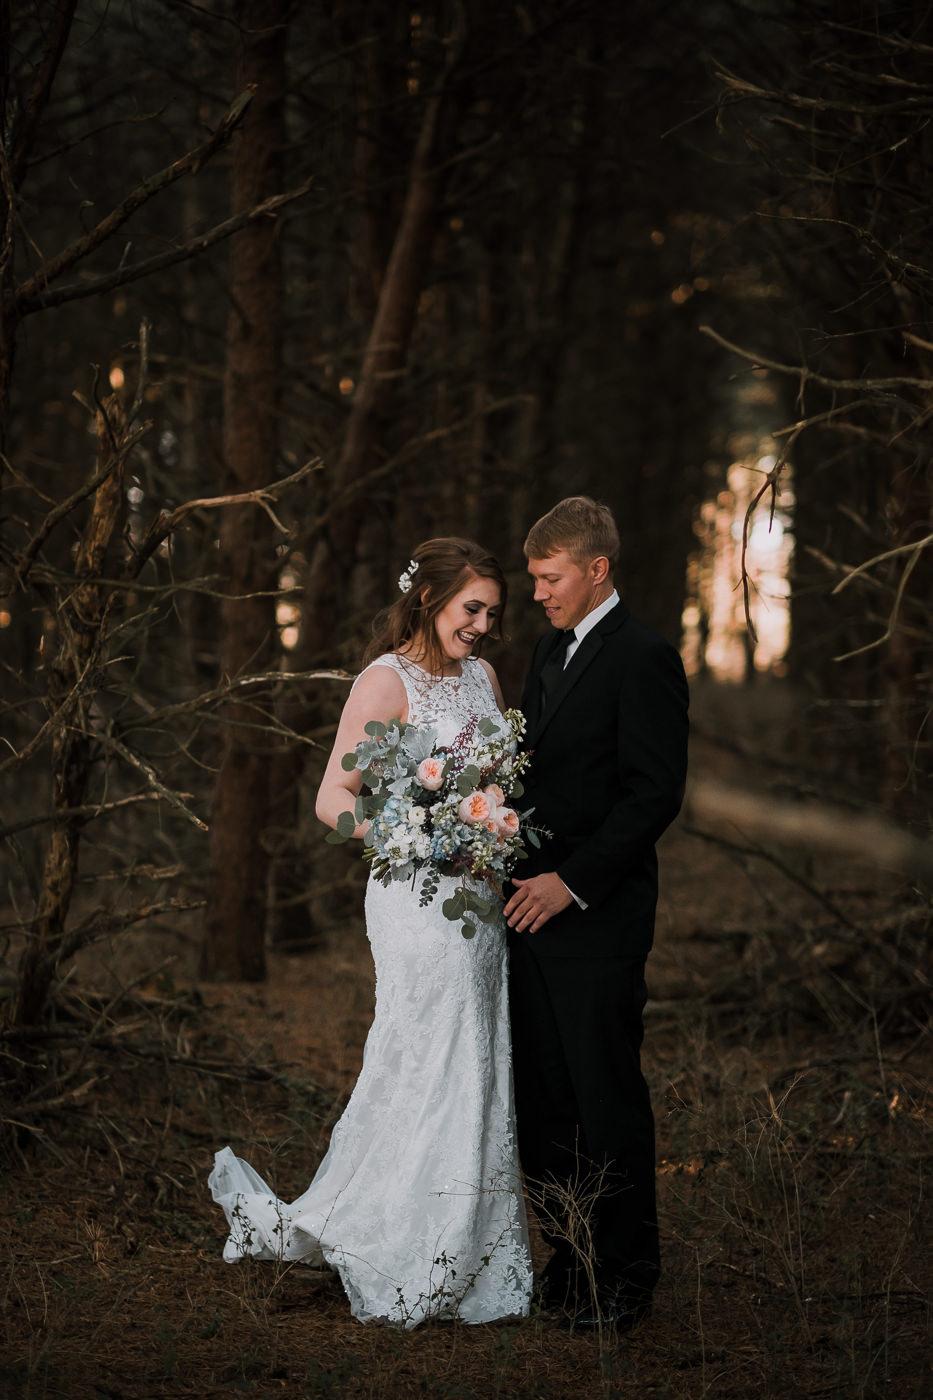 rogers.arkansas.weddingphotos.©2018mileswittboyer-14.jpg